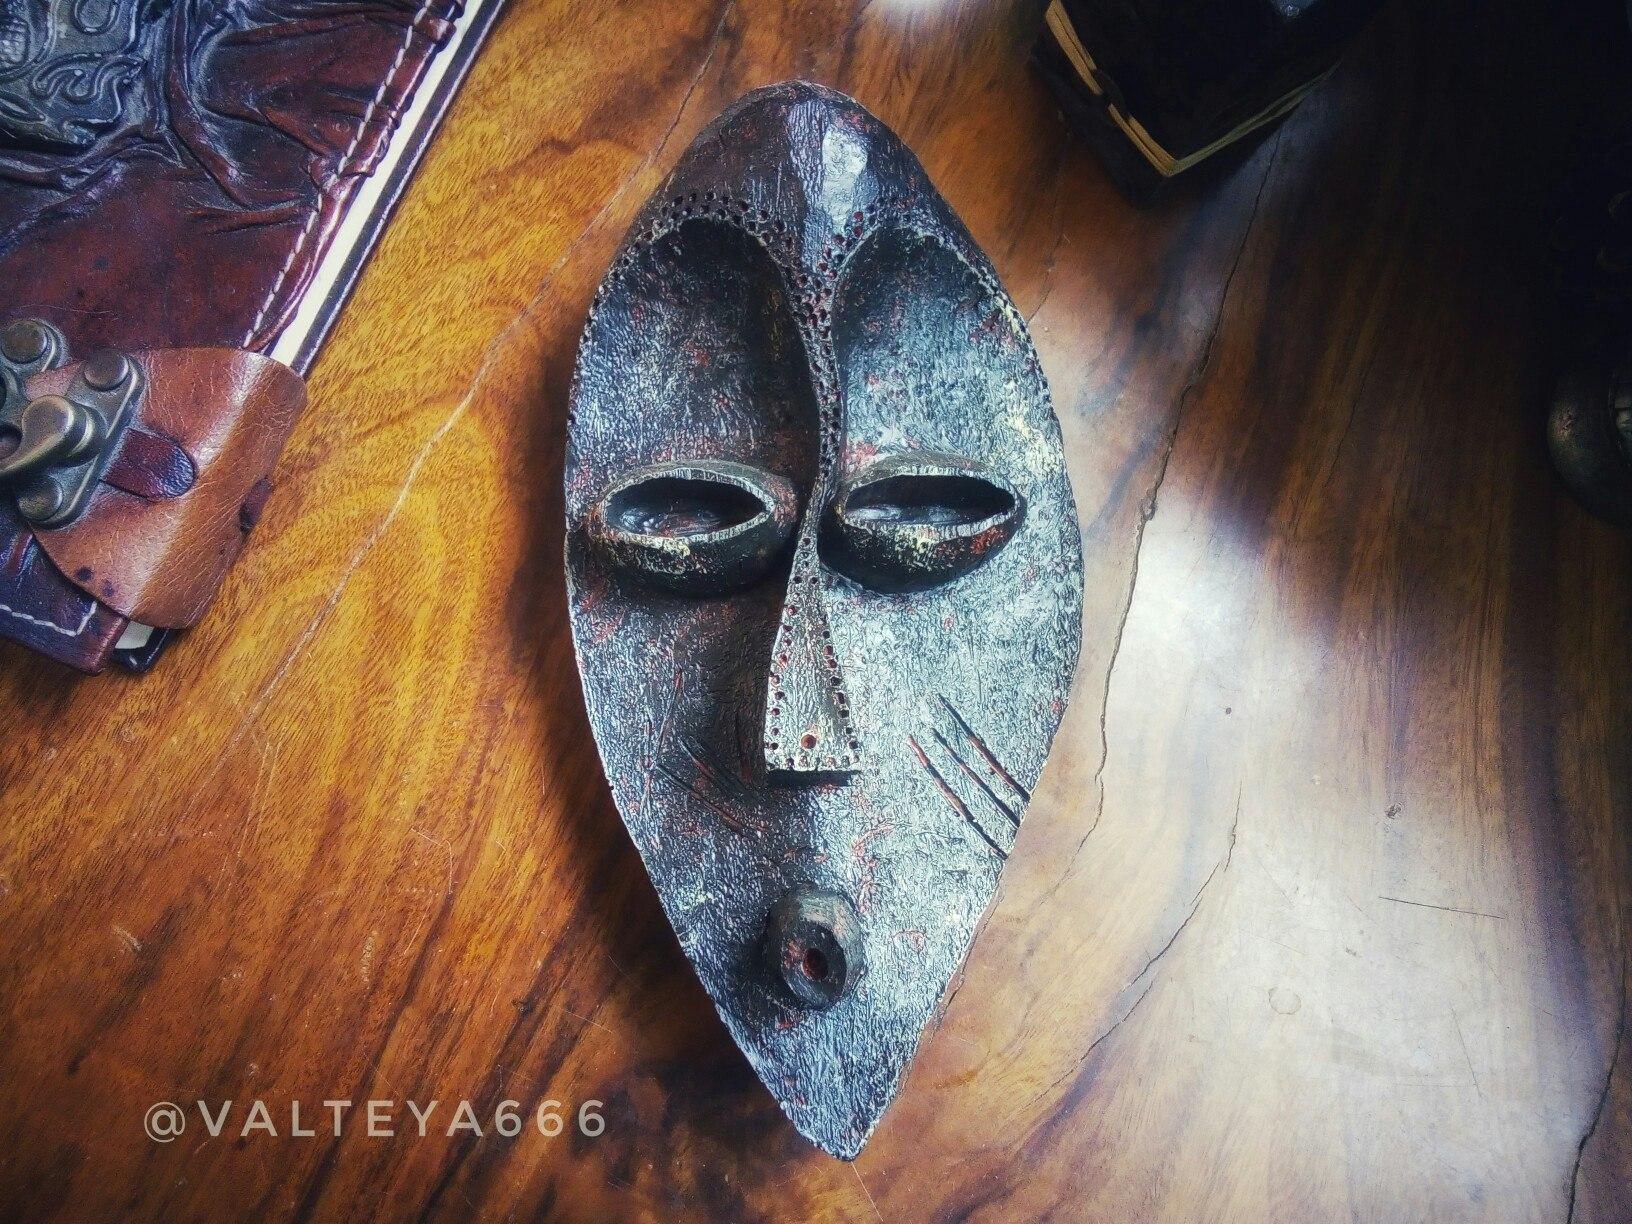 защитапомещения - Настенные маски с магическими программами.  WZdcoEL1PiU